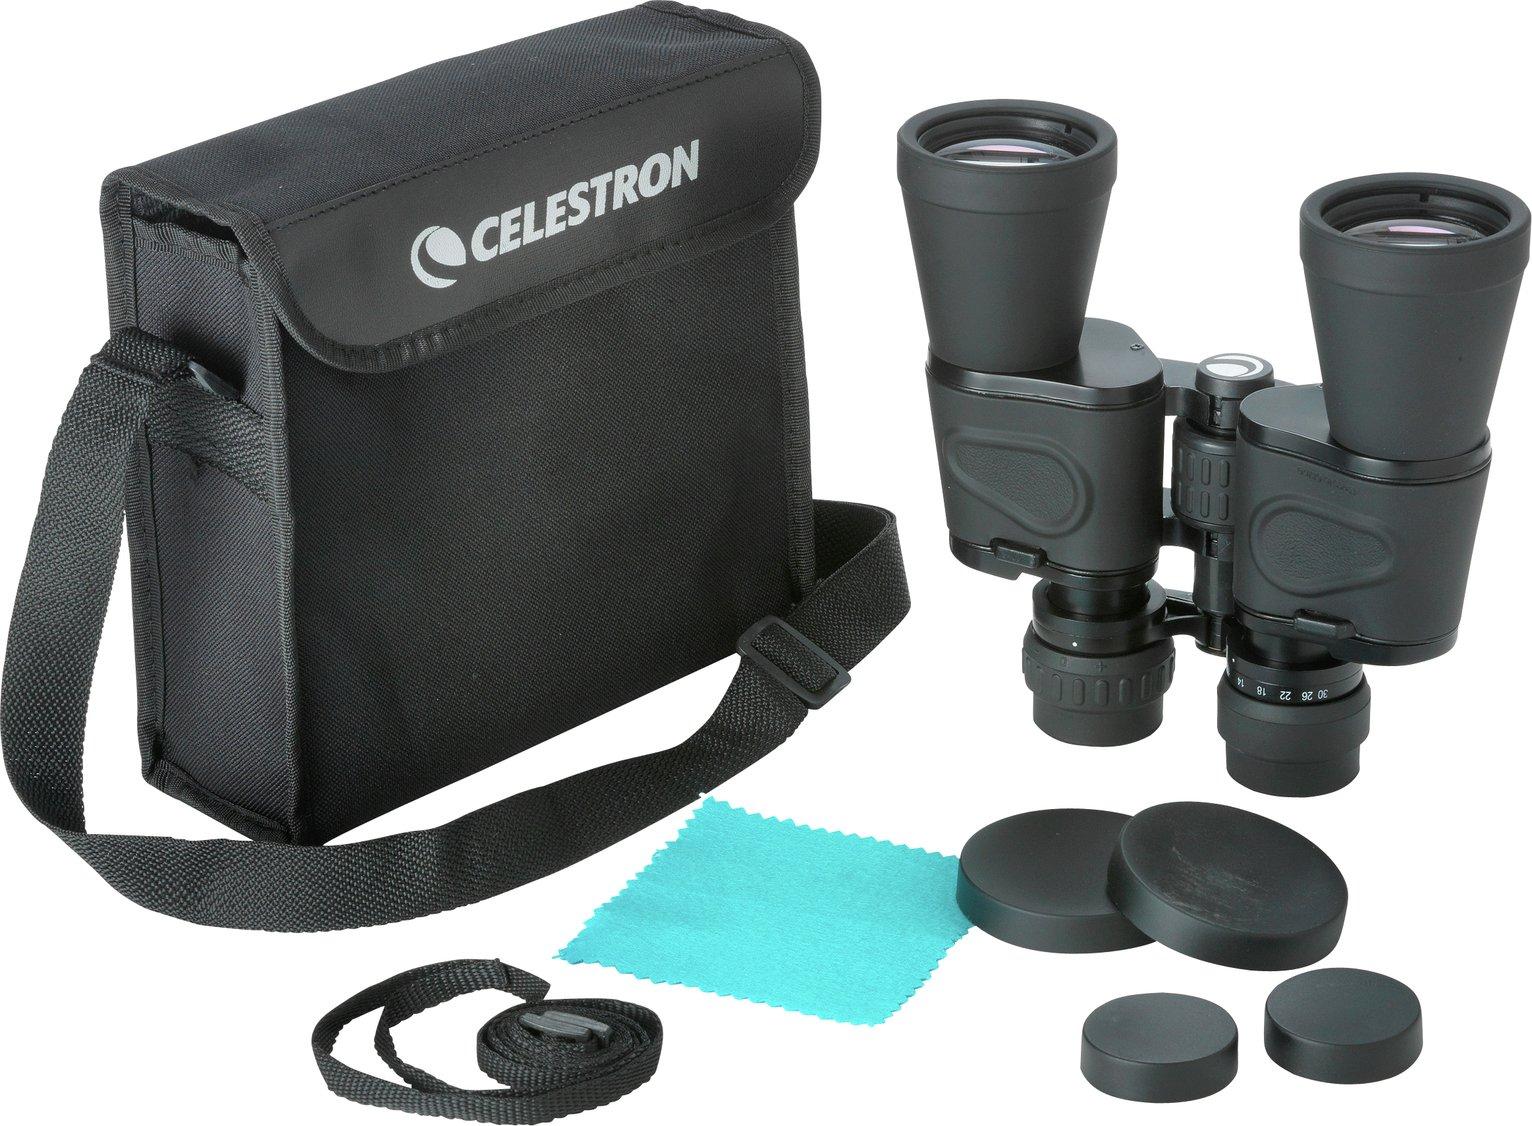 Celestron Upclose G2 10x-30x 50mm Zoom Binoculars